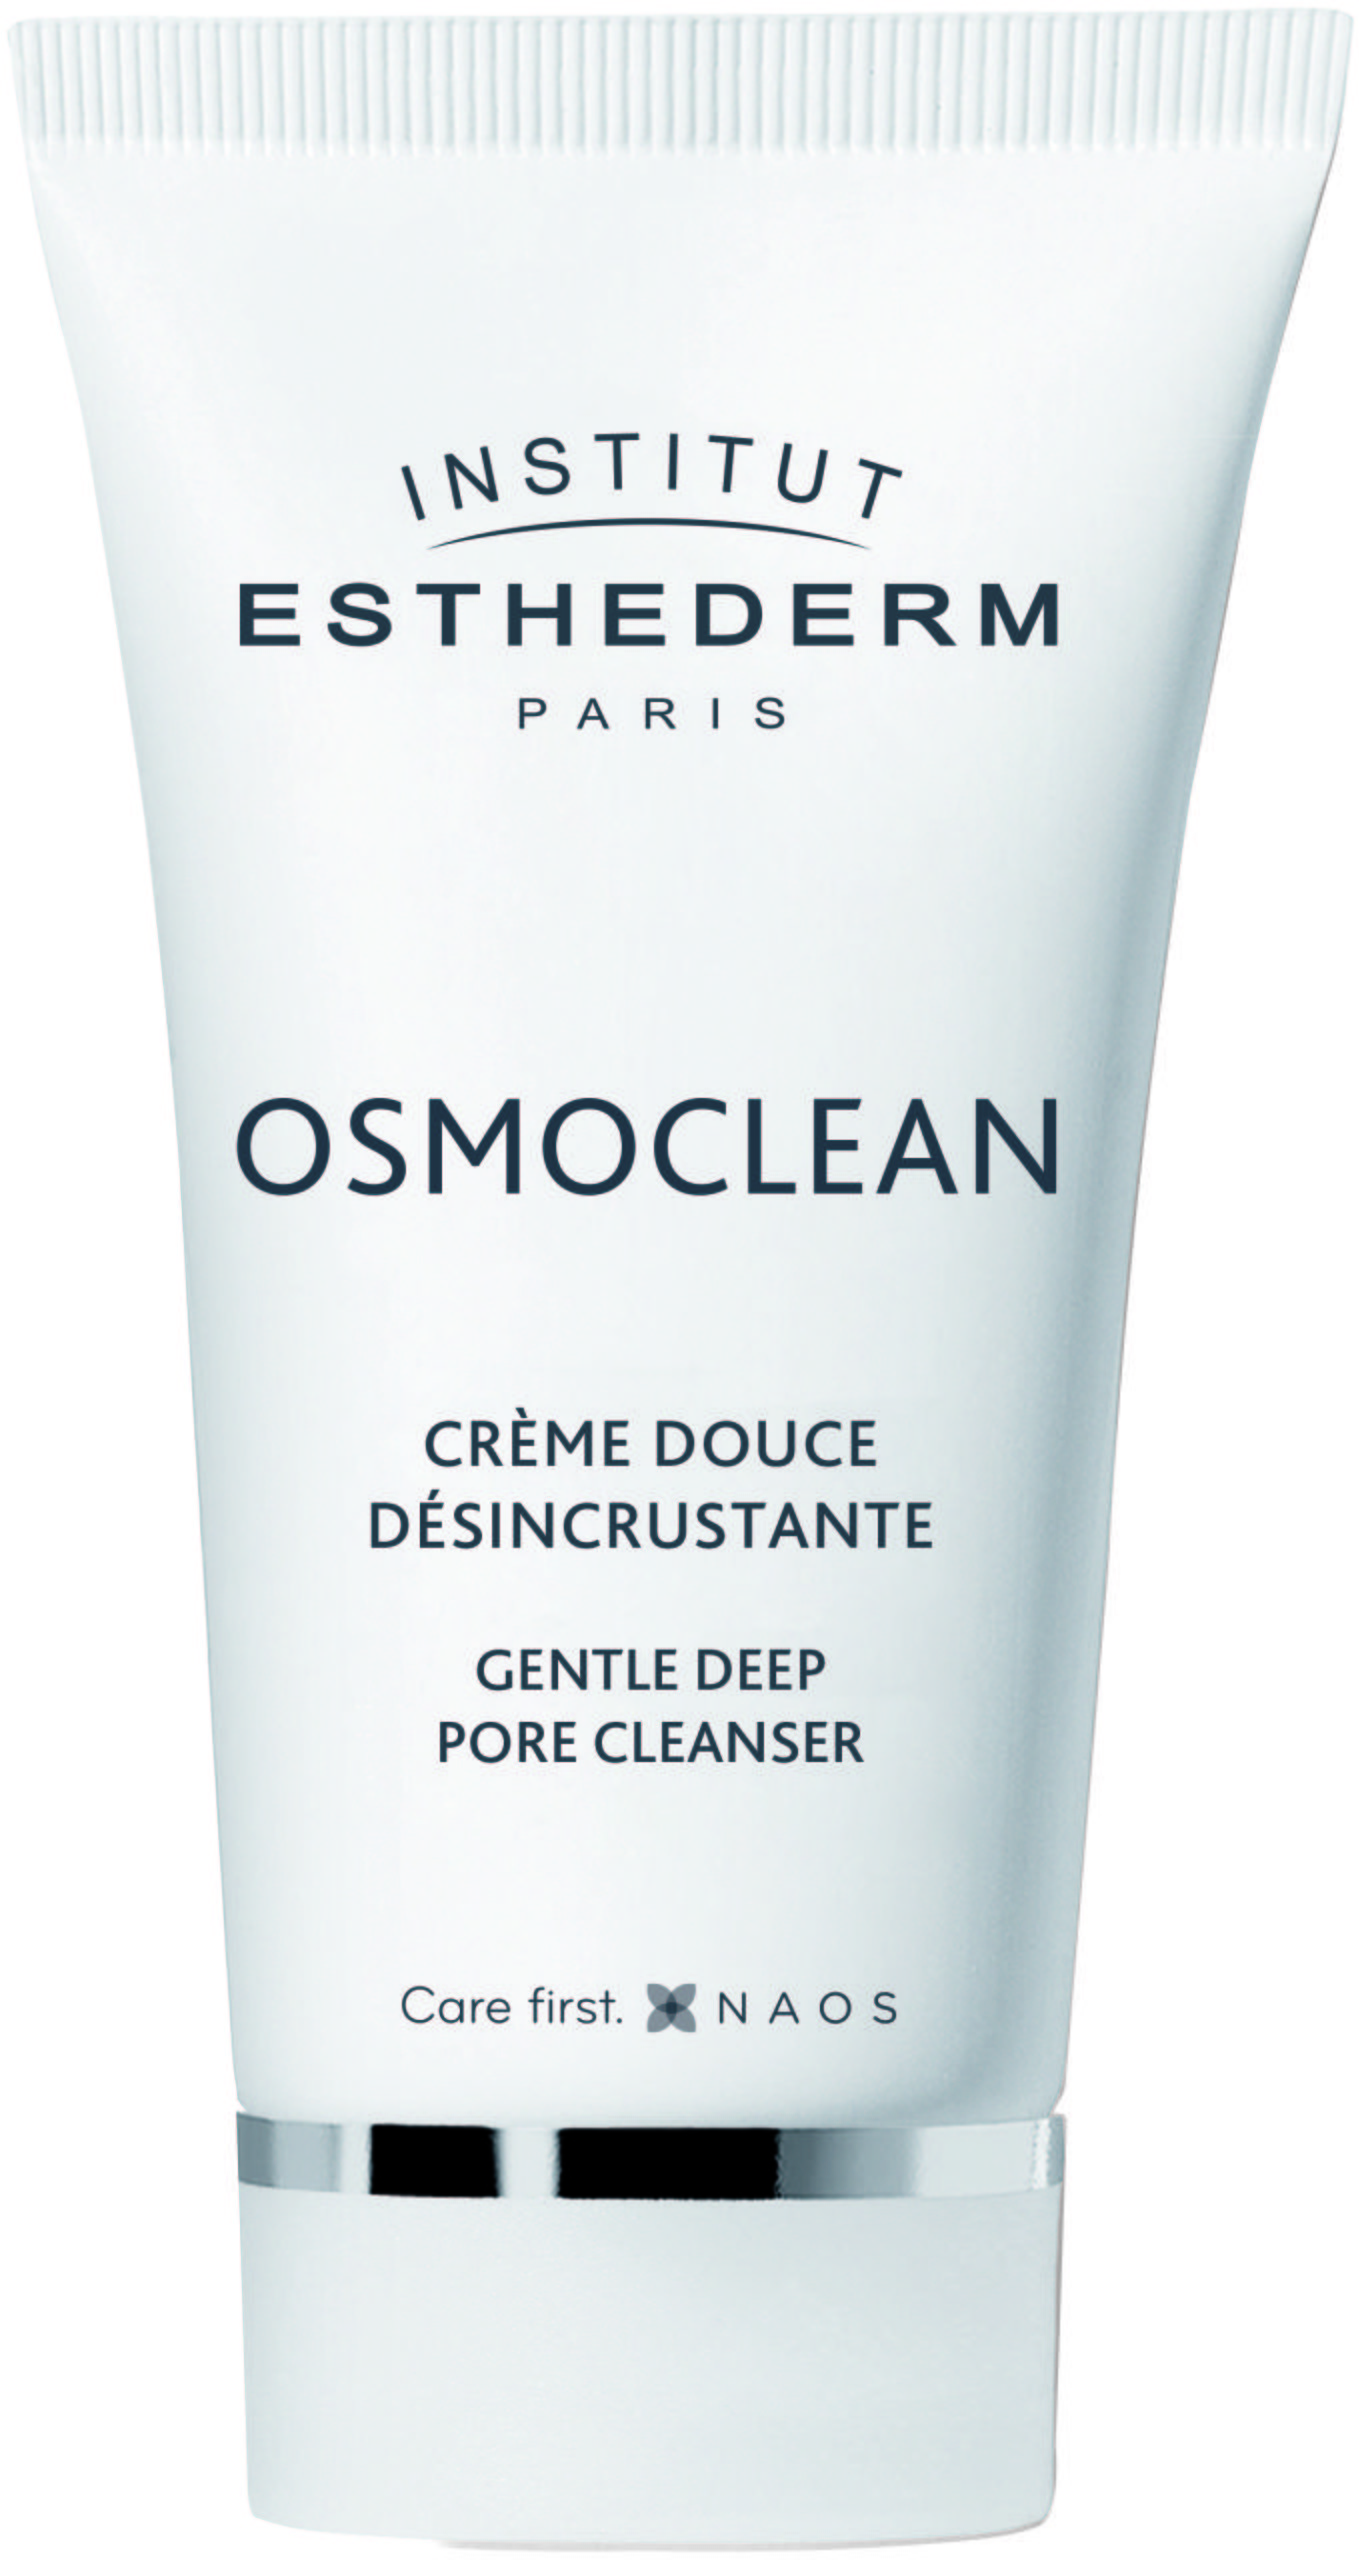 INSTITUT ESTHEDERM- OSMOCLEAN GENTLE DEEP PORE CLEANSER